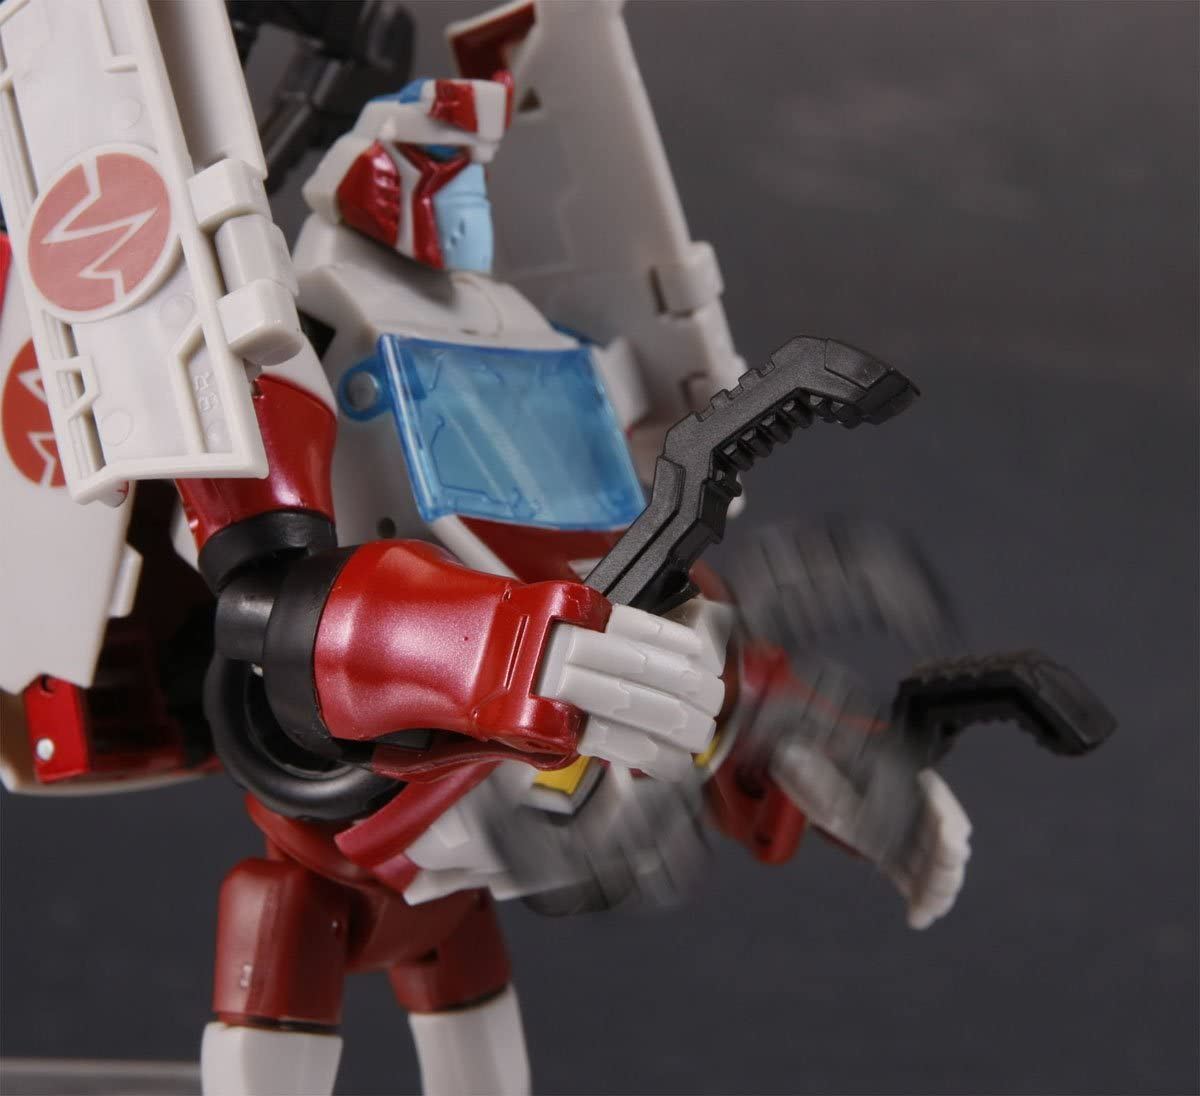 TA04 Ratchet by Takara Tomy Japanese Transformers Animated